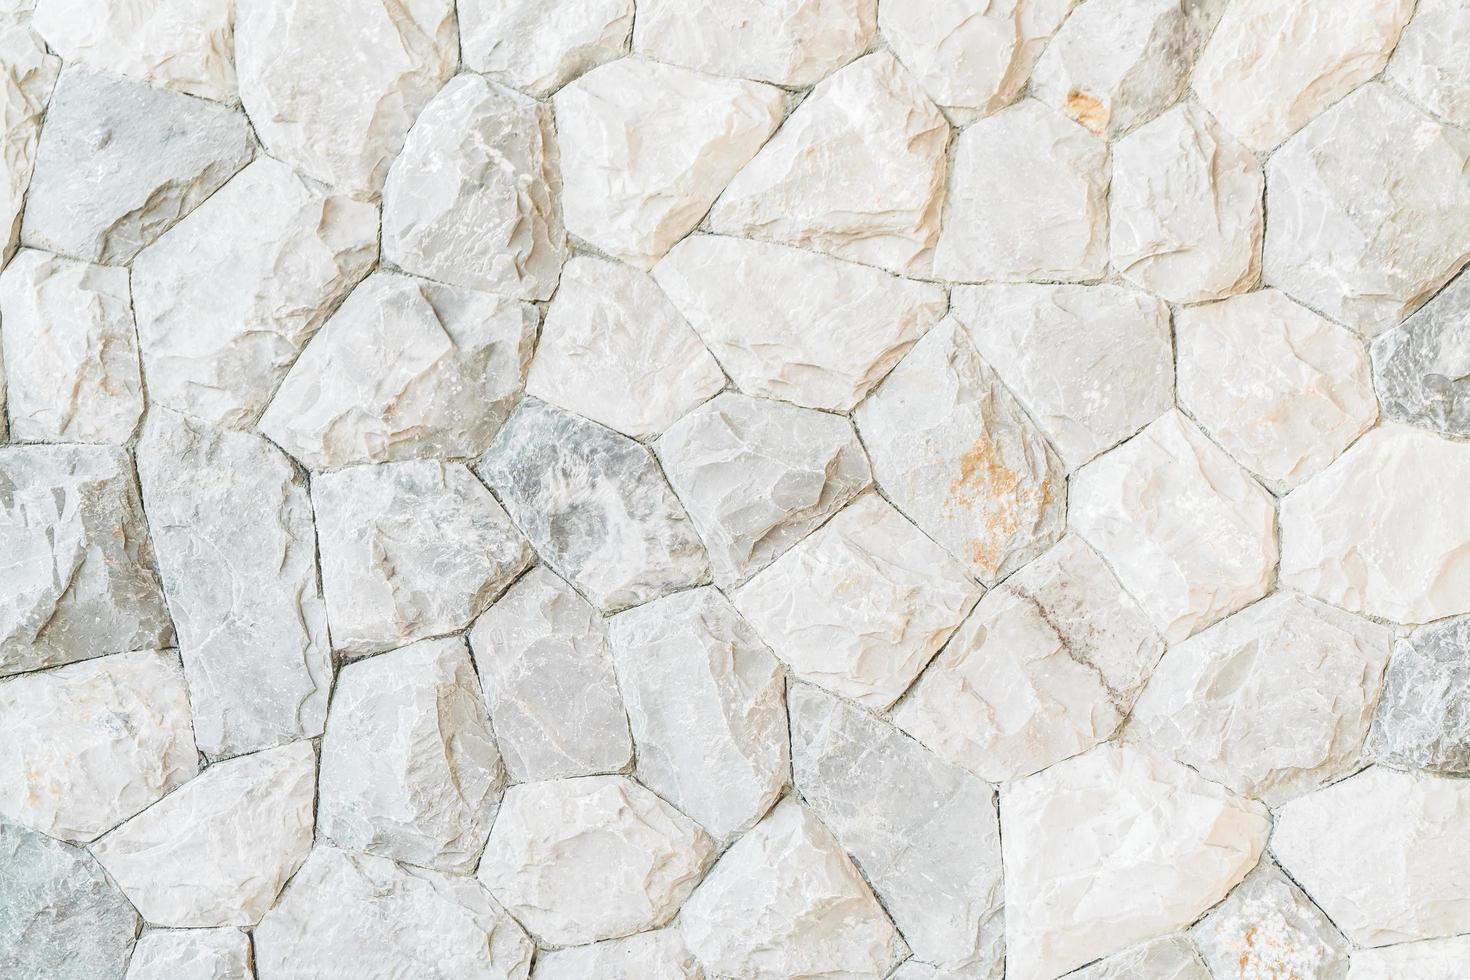 vita stenstrukturer foto